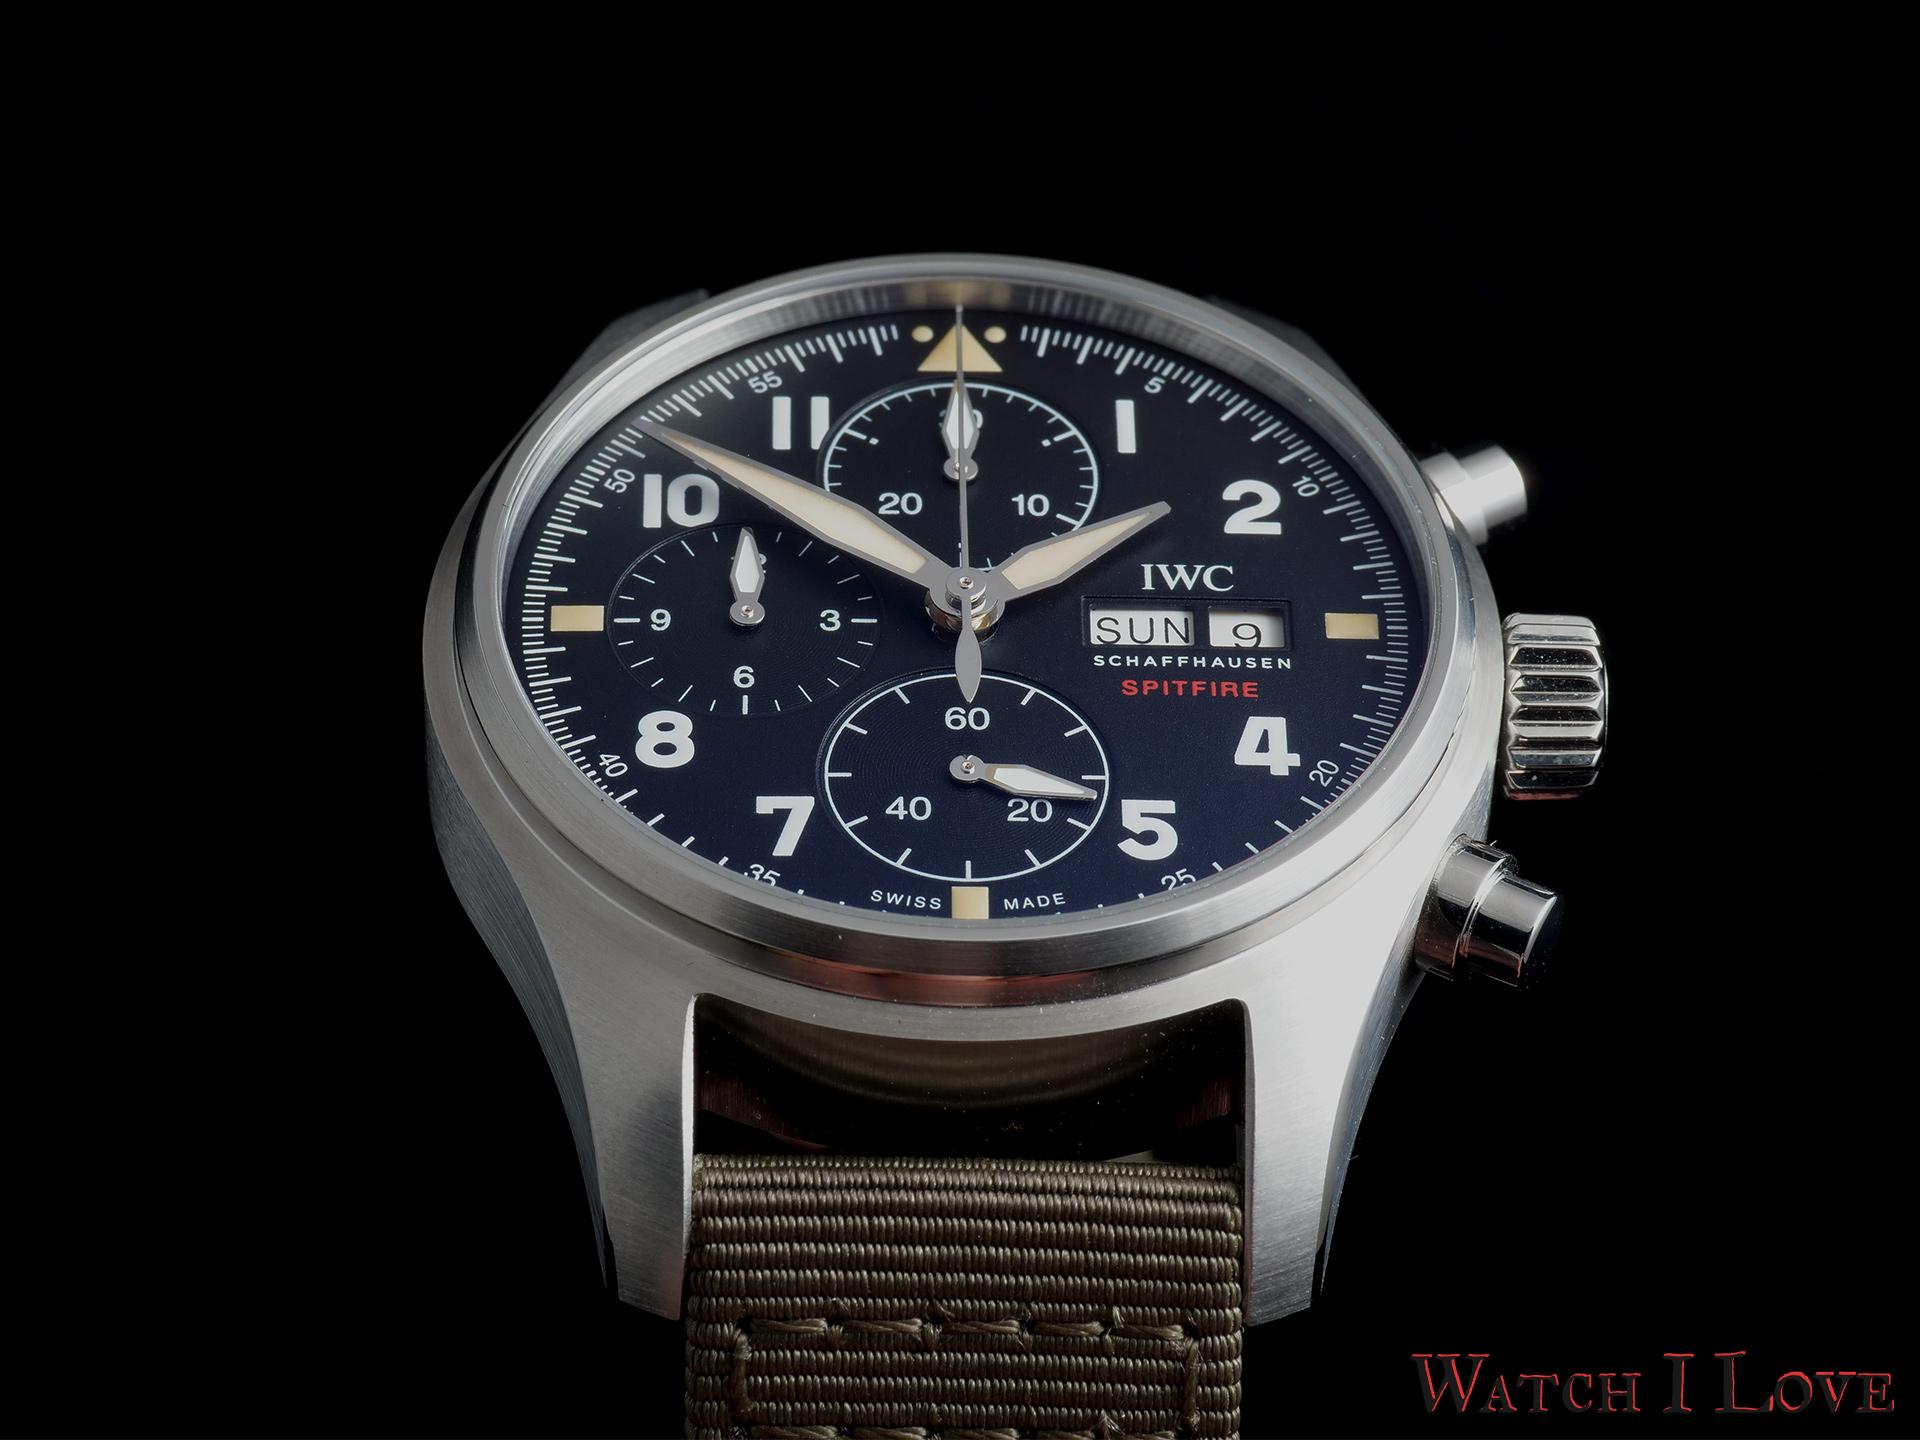 IWC Pilot's Watch Chronograph Spitfire Ref. IW387901 soldat